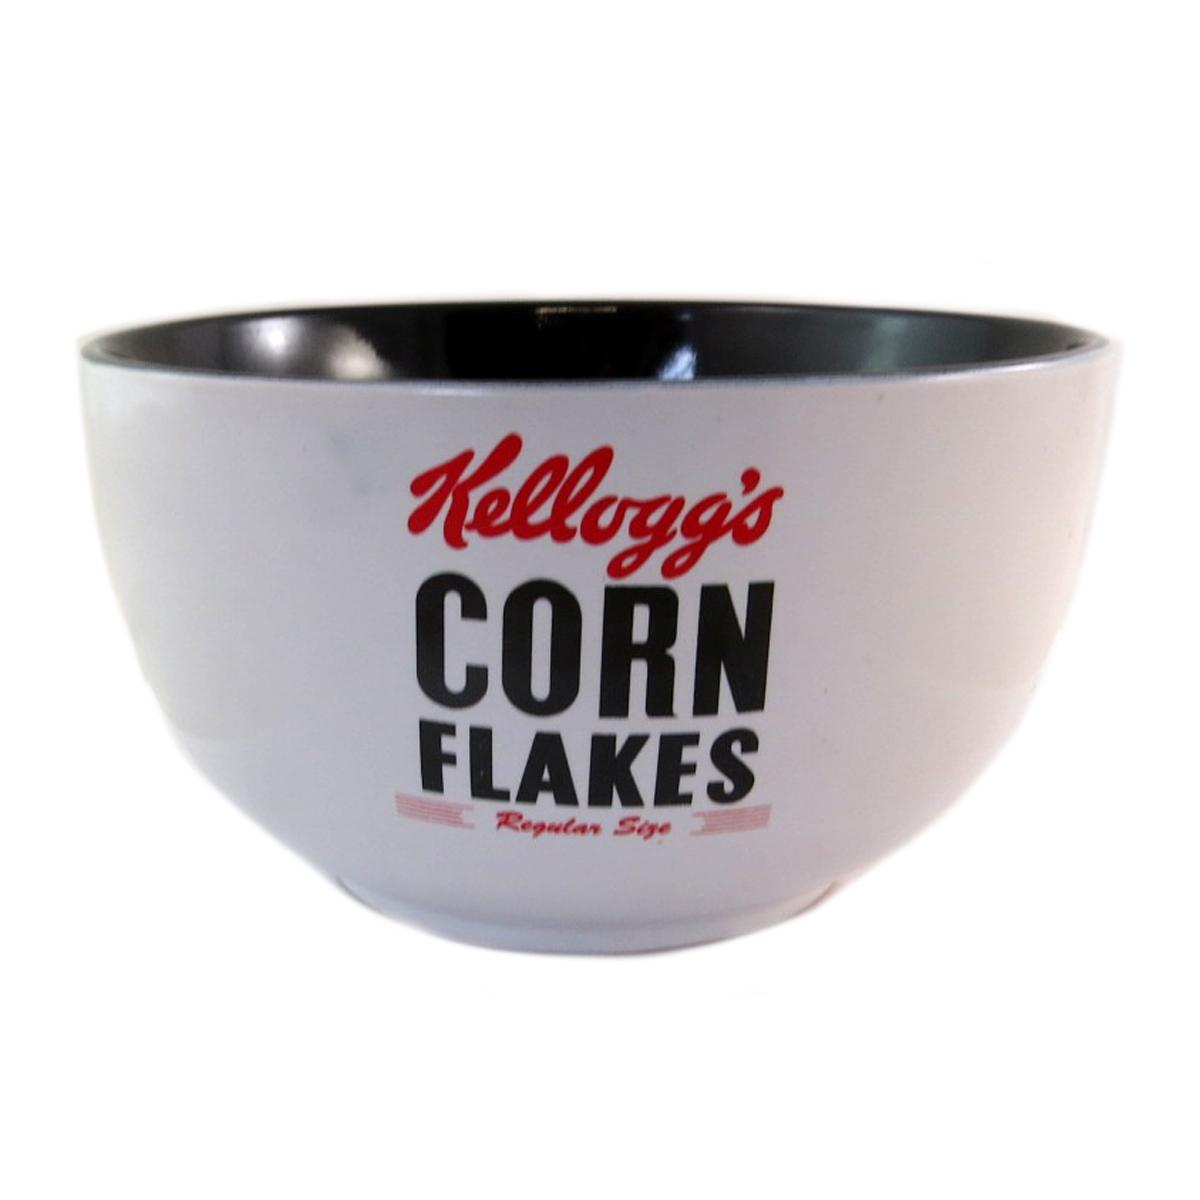 Bol céramique \'Kellogg\'s\' noir blanc (Corn Flakes) - 14x8 cm - [Q0319]